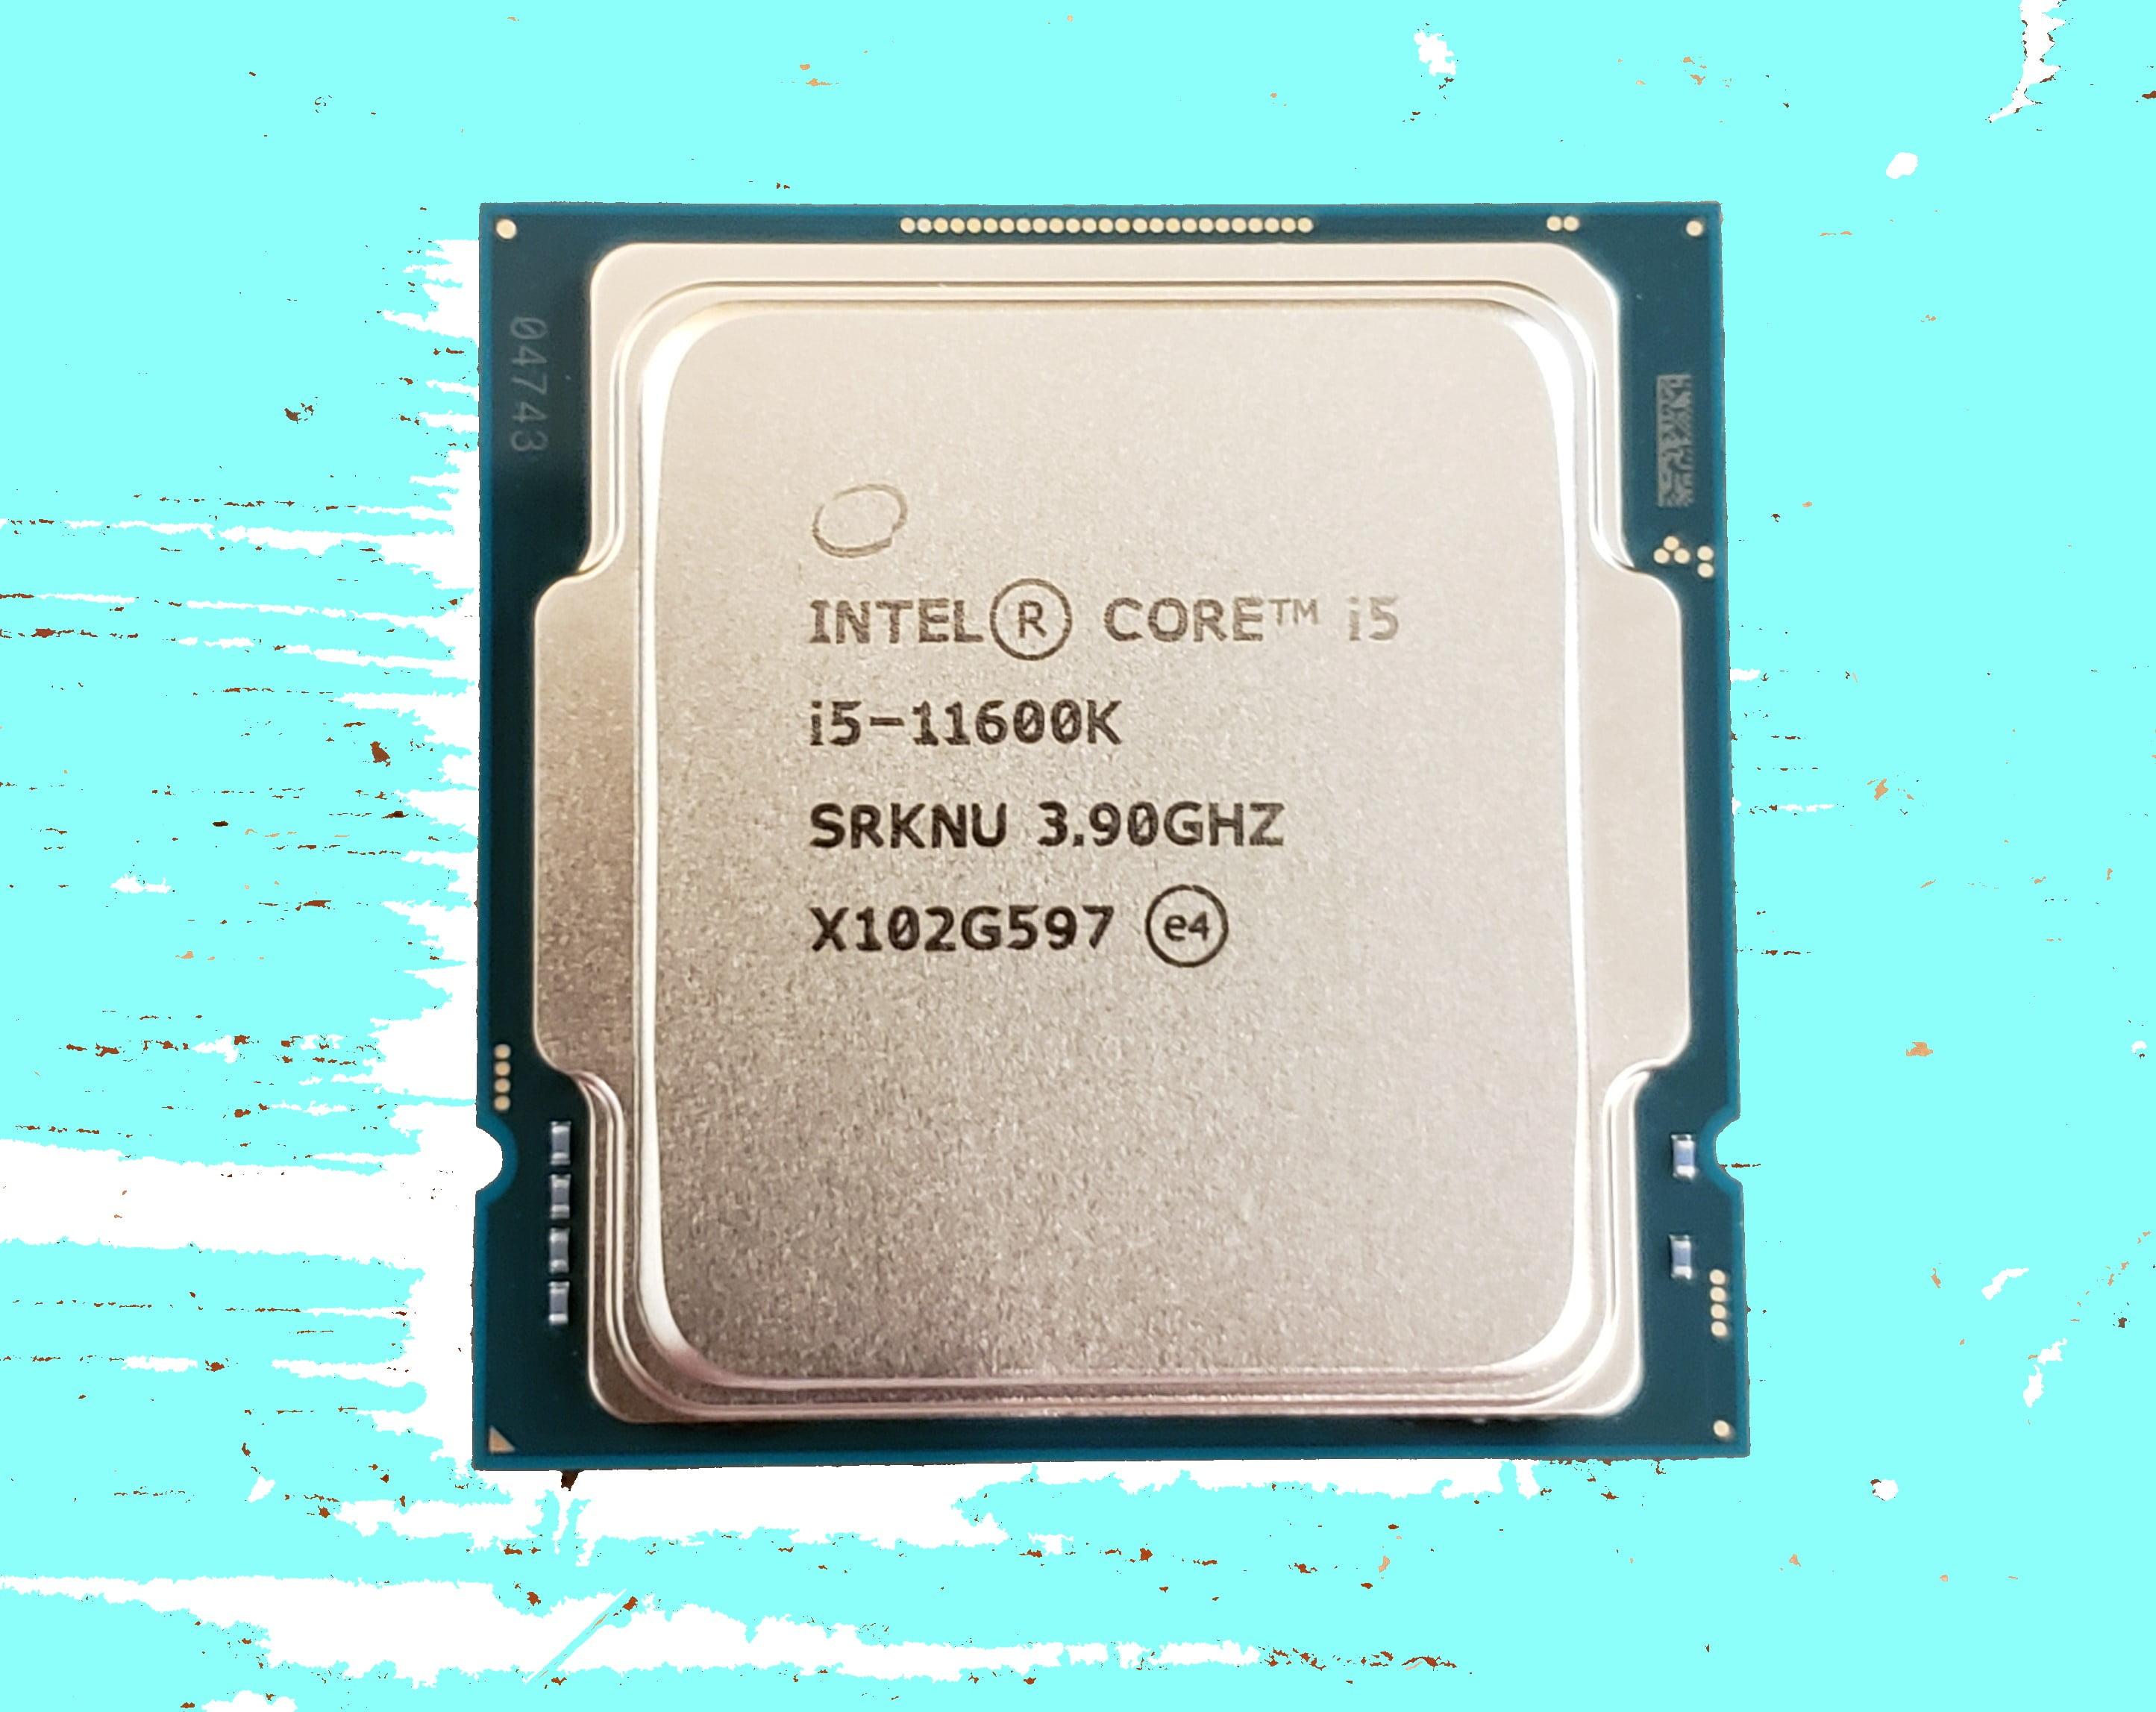 Intel UHD 750 (Rocket Lake) Review: It might just get you through the GPU crisis